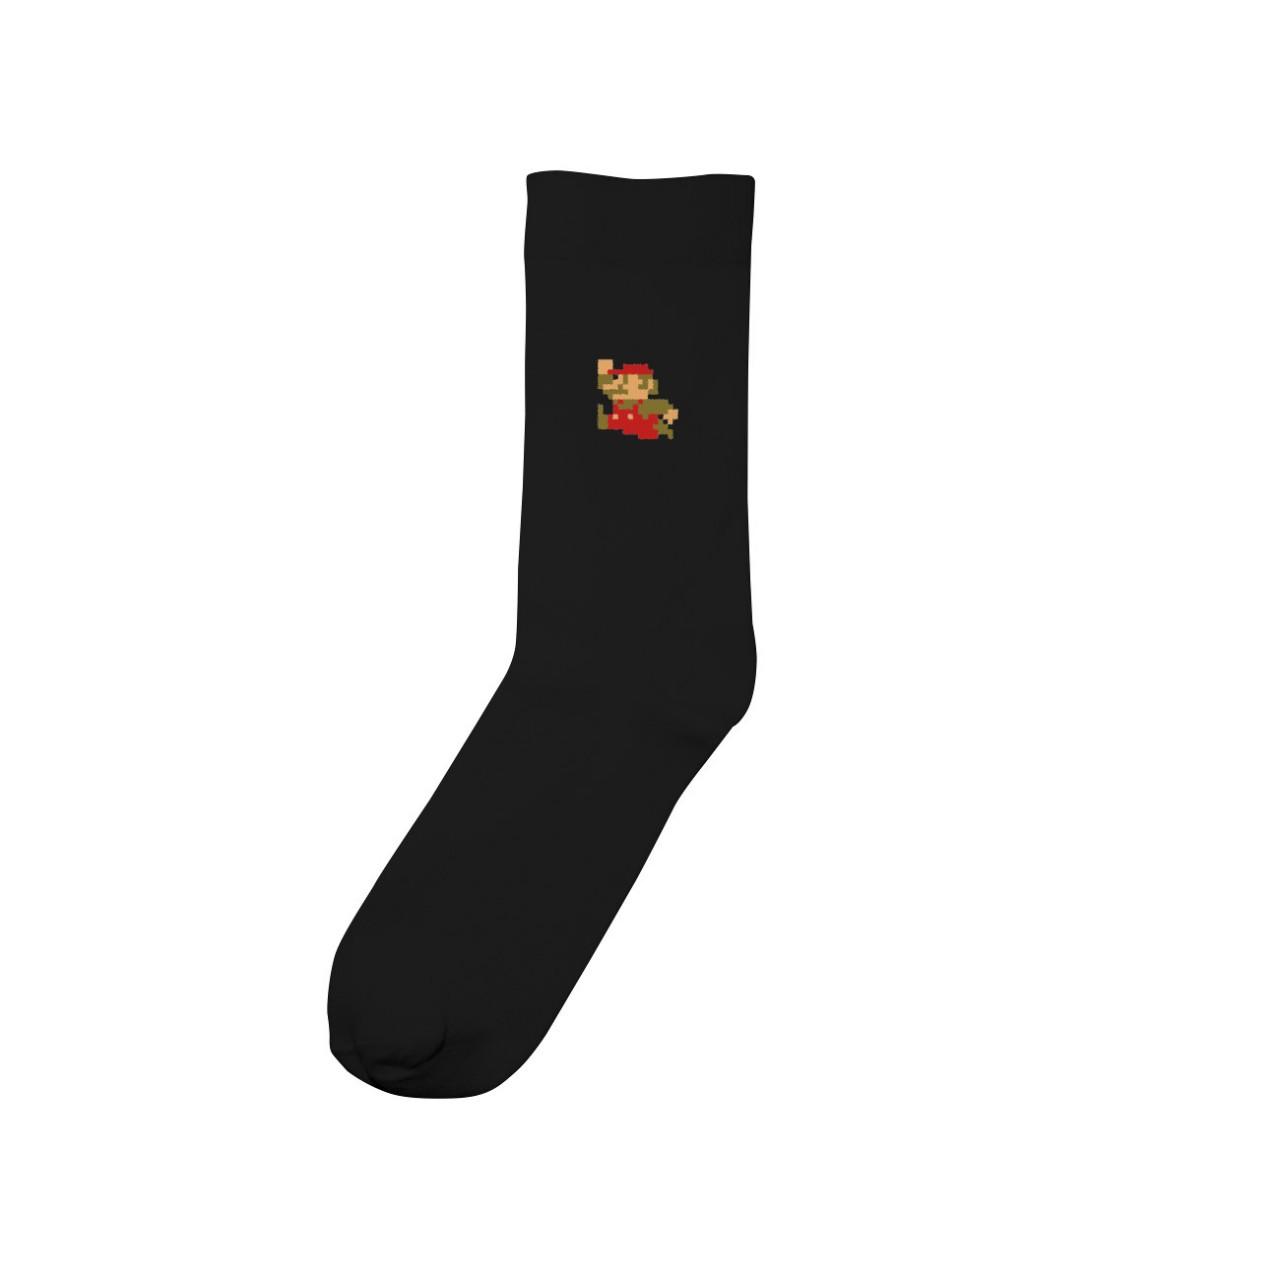 Socks Sigtuna Super Mario Black